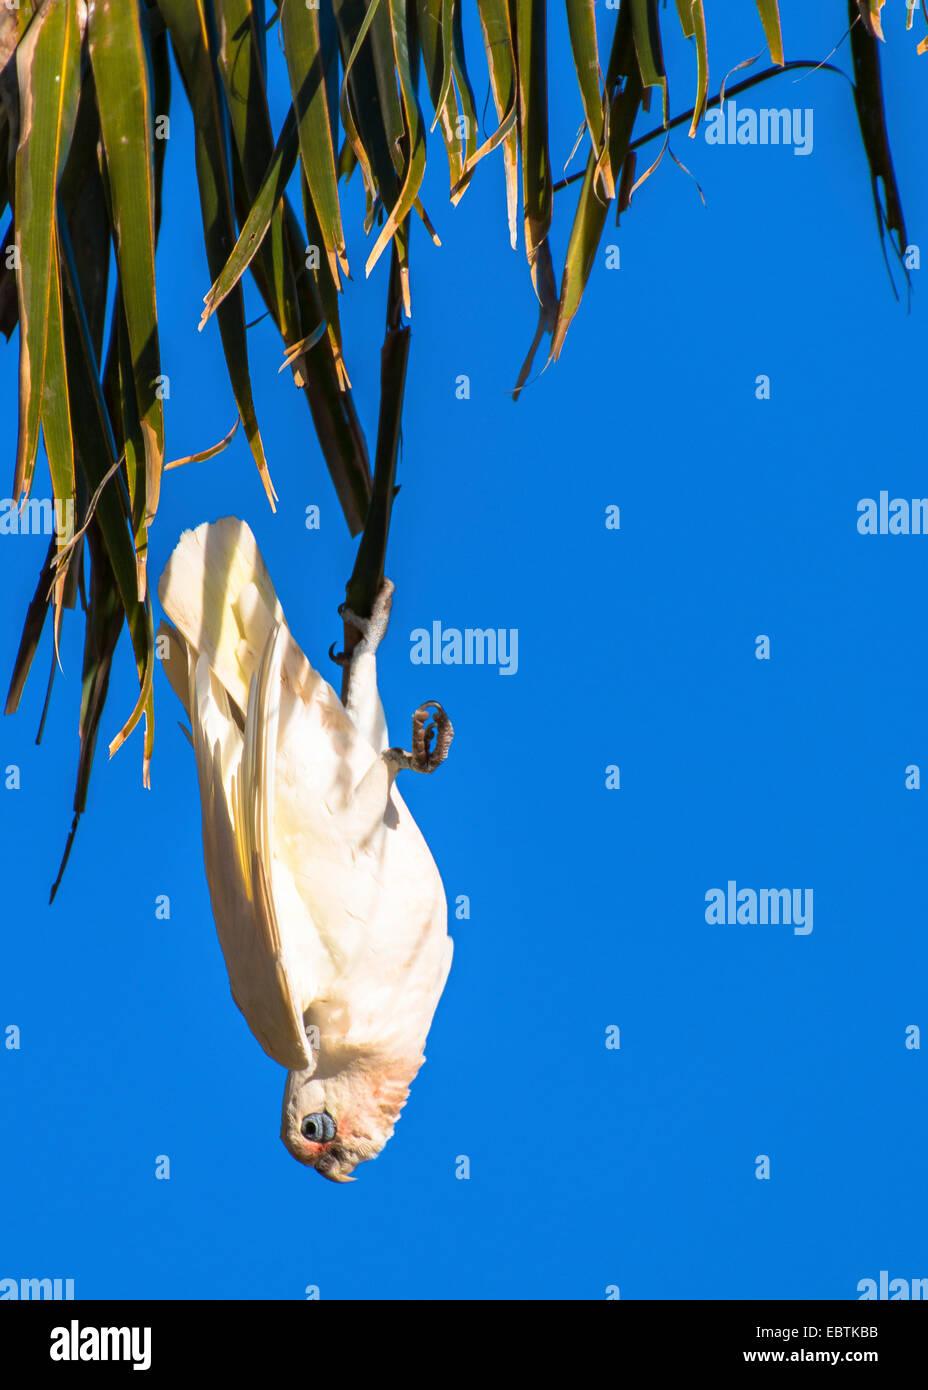 little corella (Cacatua sanguinea), klimbing on a palm tree, Australia, Western Australia, Carnarvon National Park - Stock Image